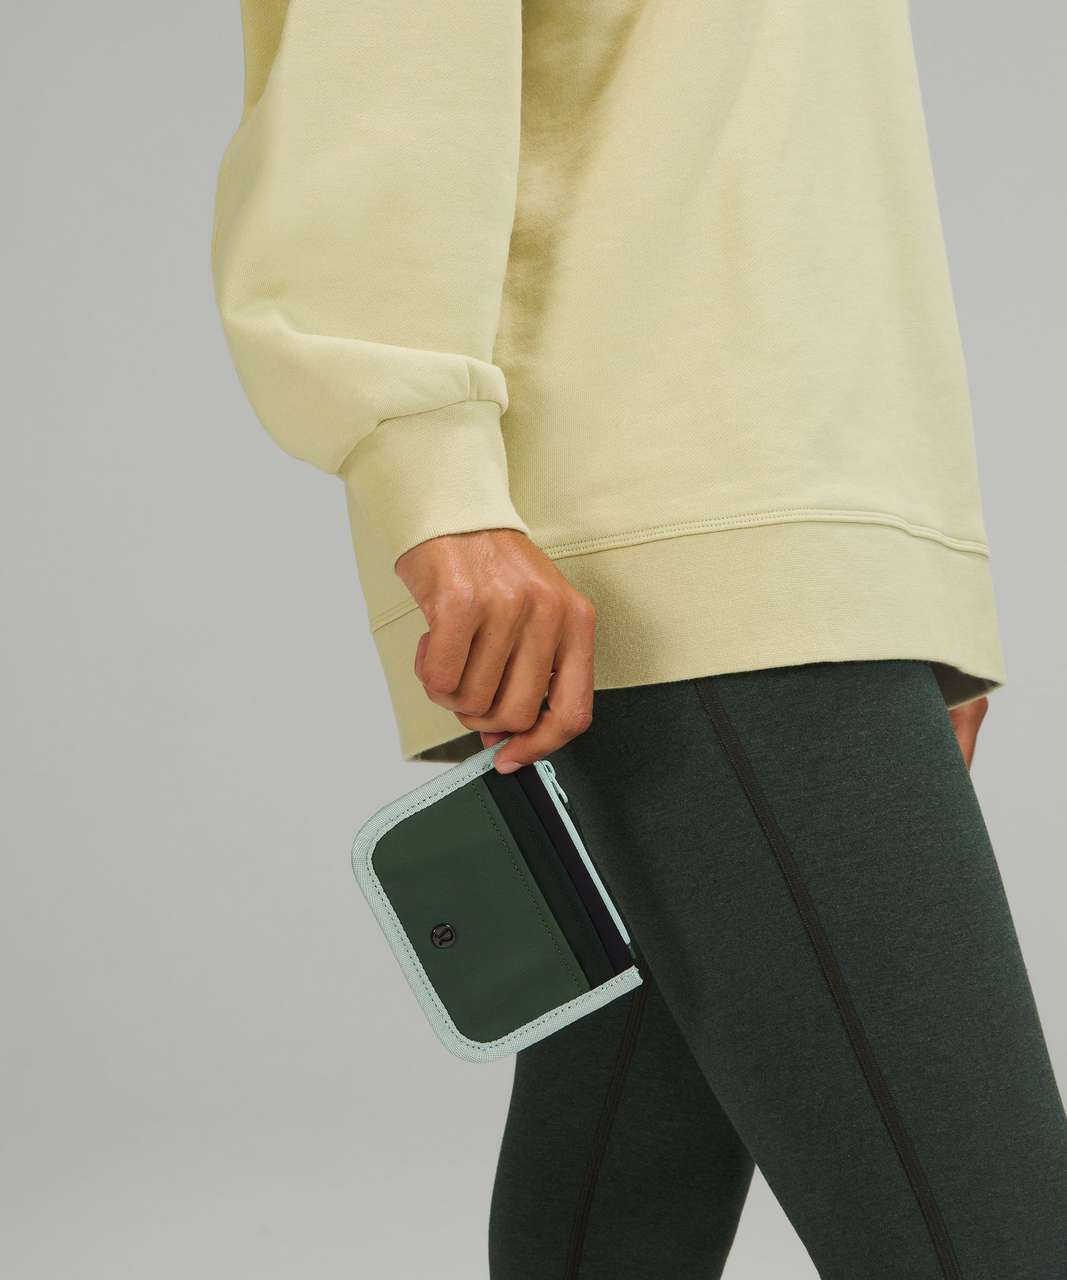 Lululemon True Identity Card Case - Green Twill / Rainforest Green / Black